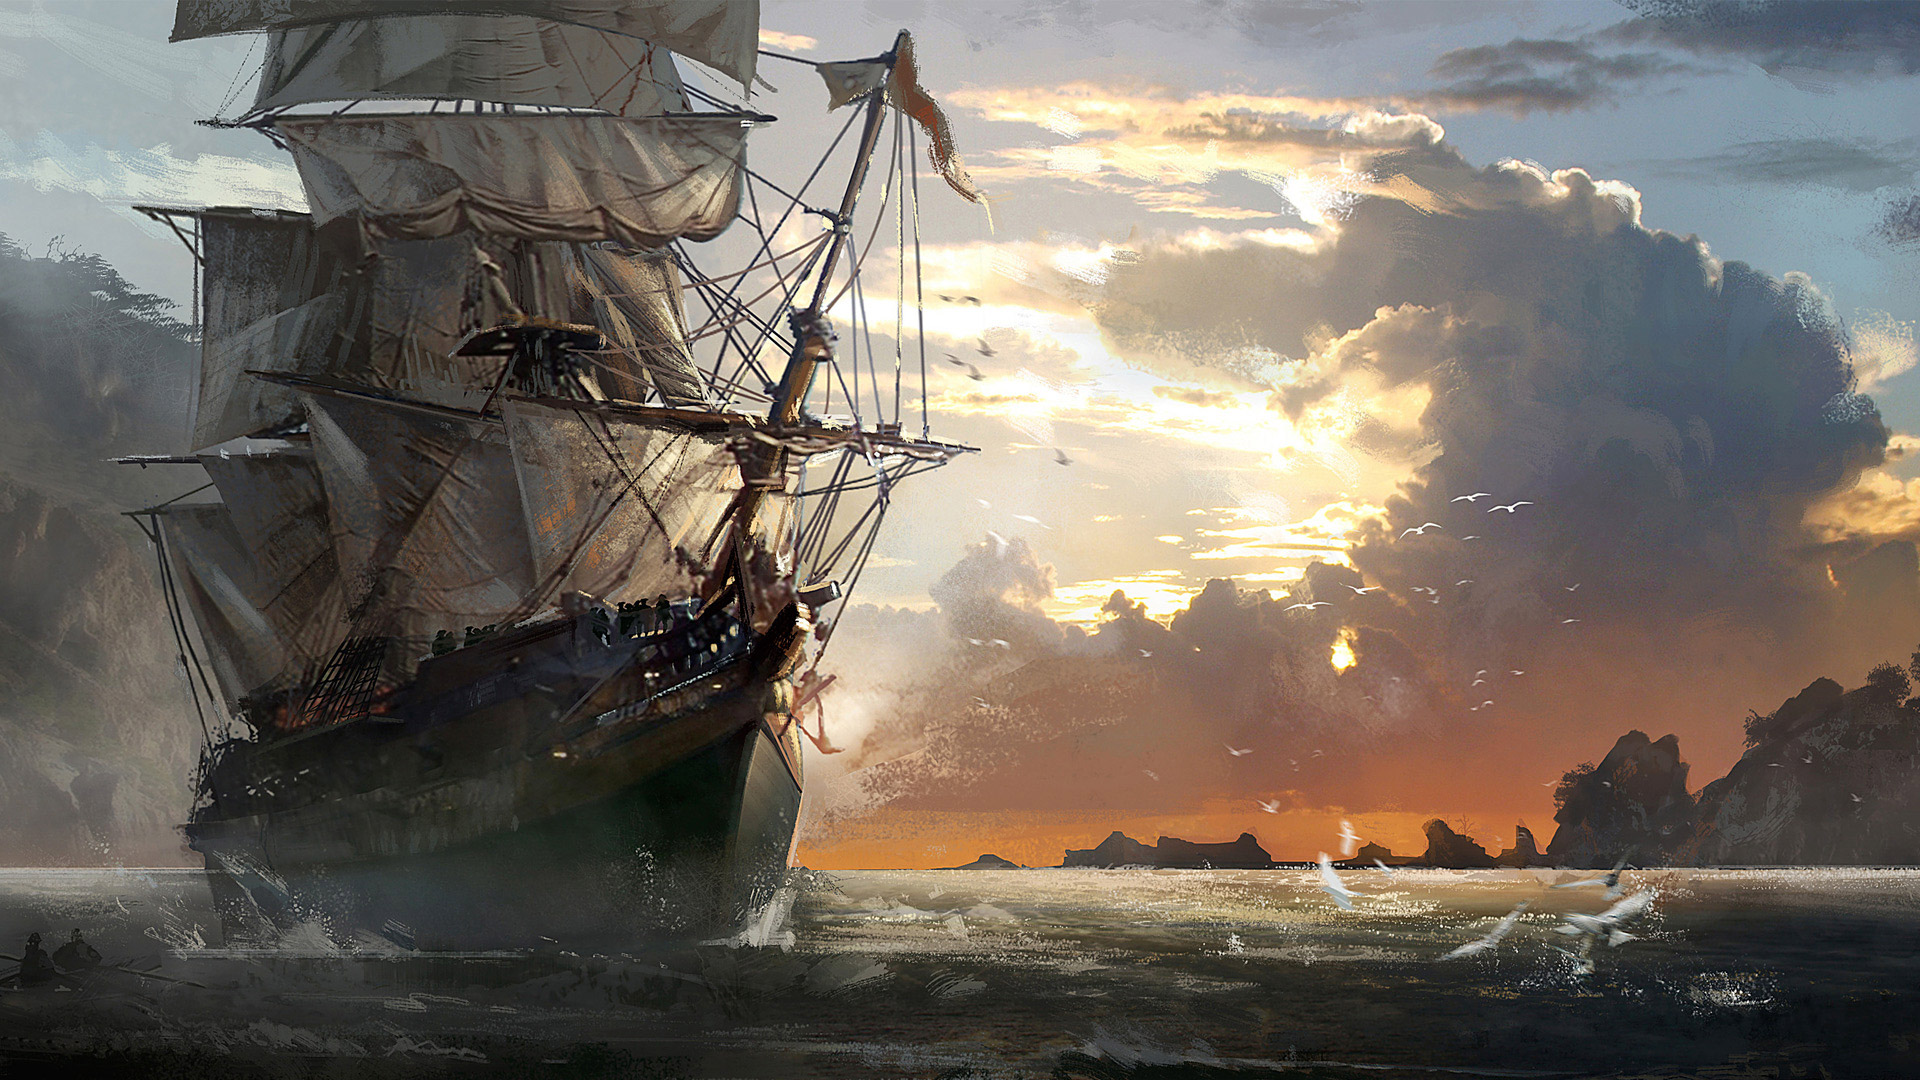 Assassin's Creed IV: Black Flag Wallpaper in 1920x1080